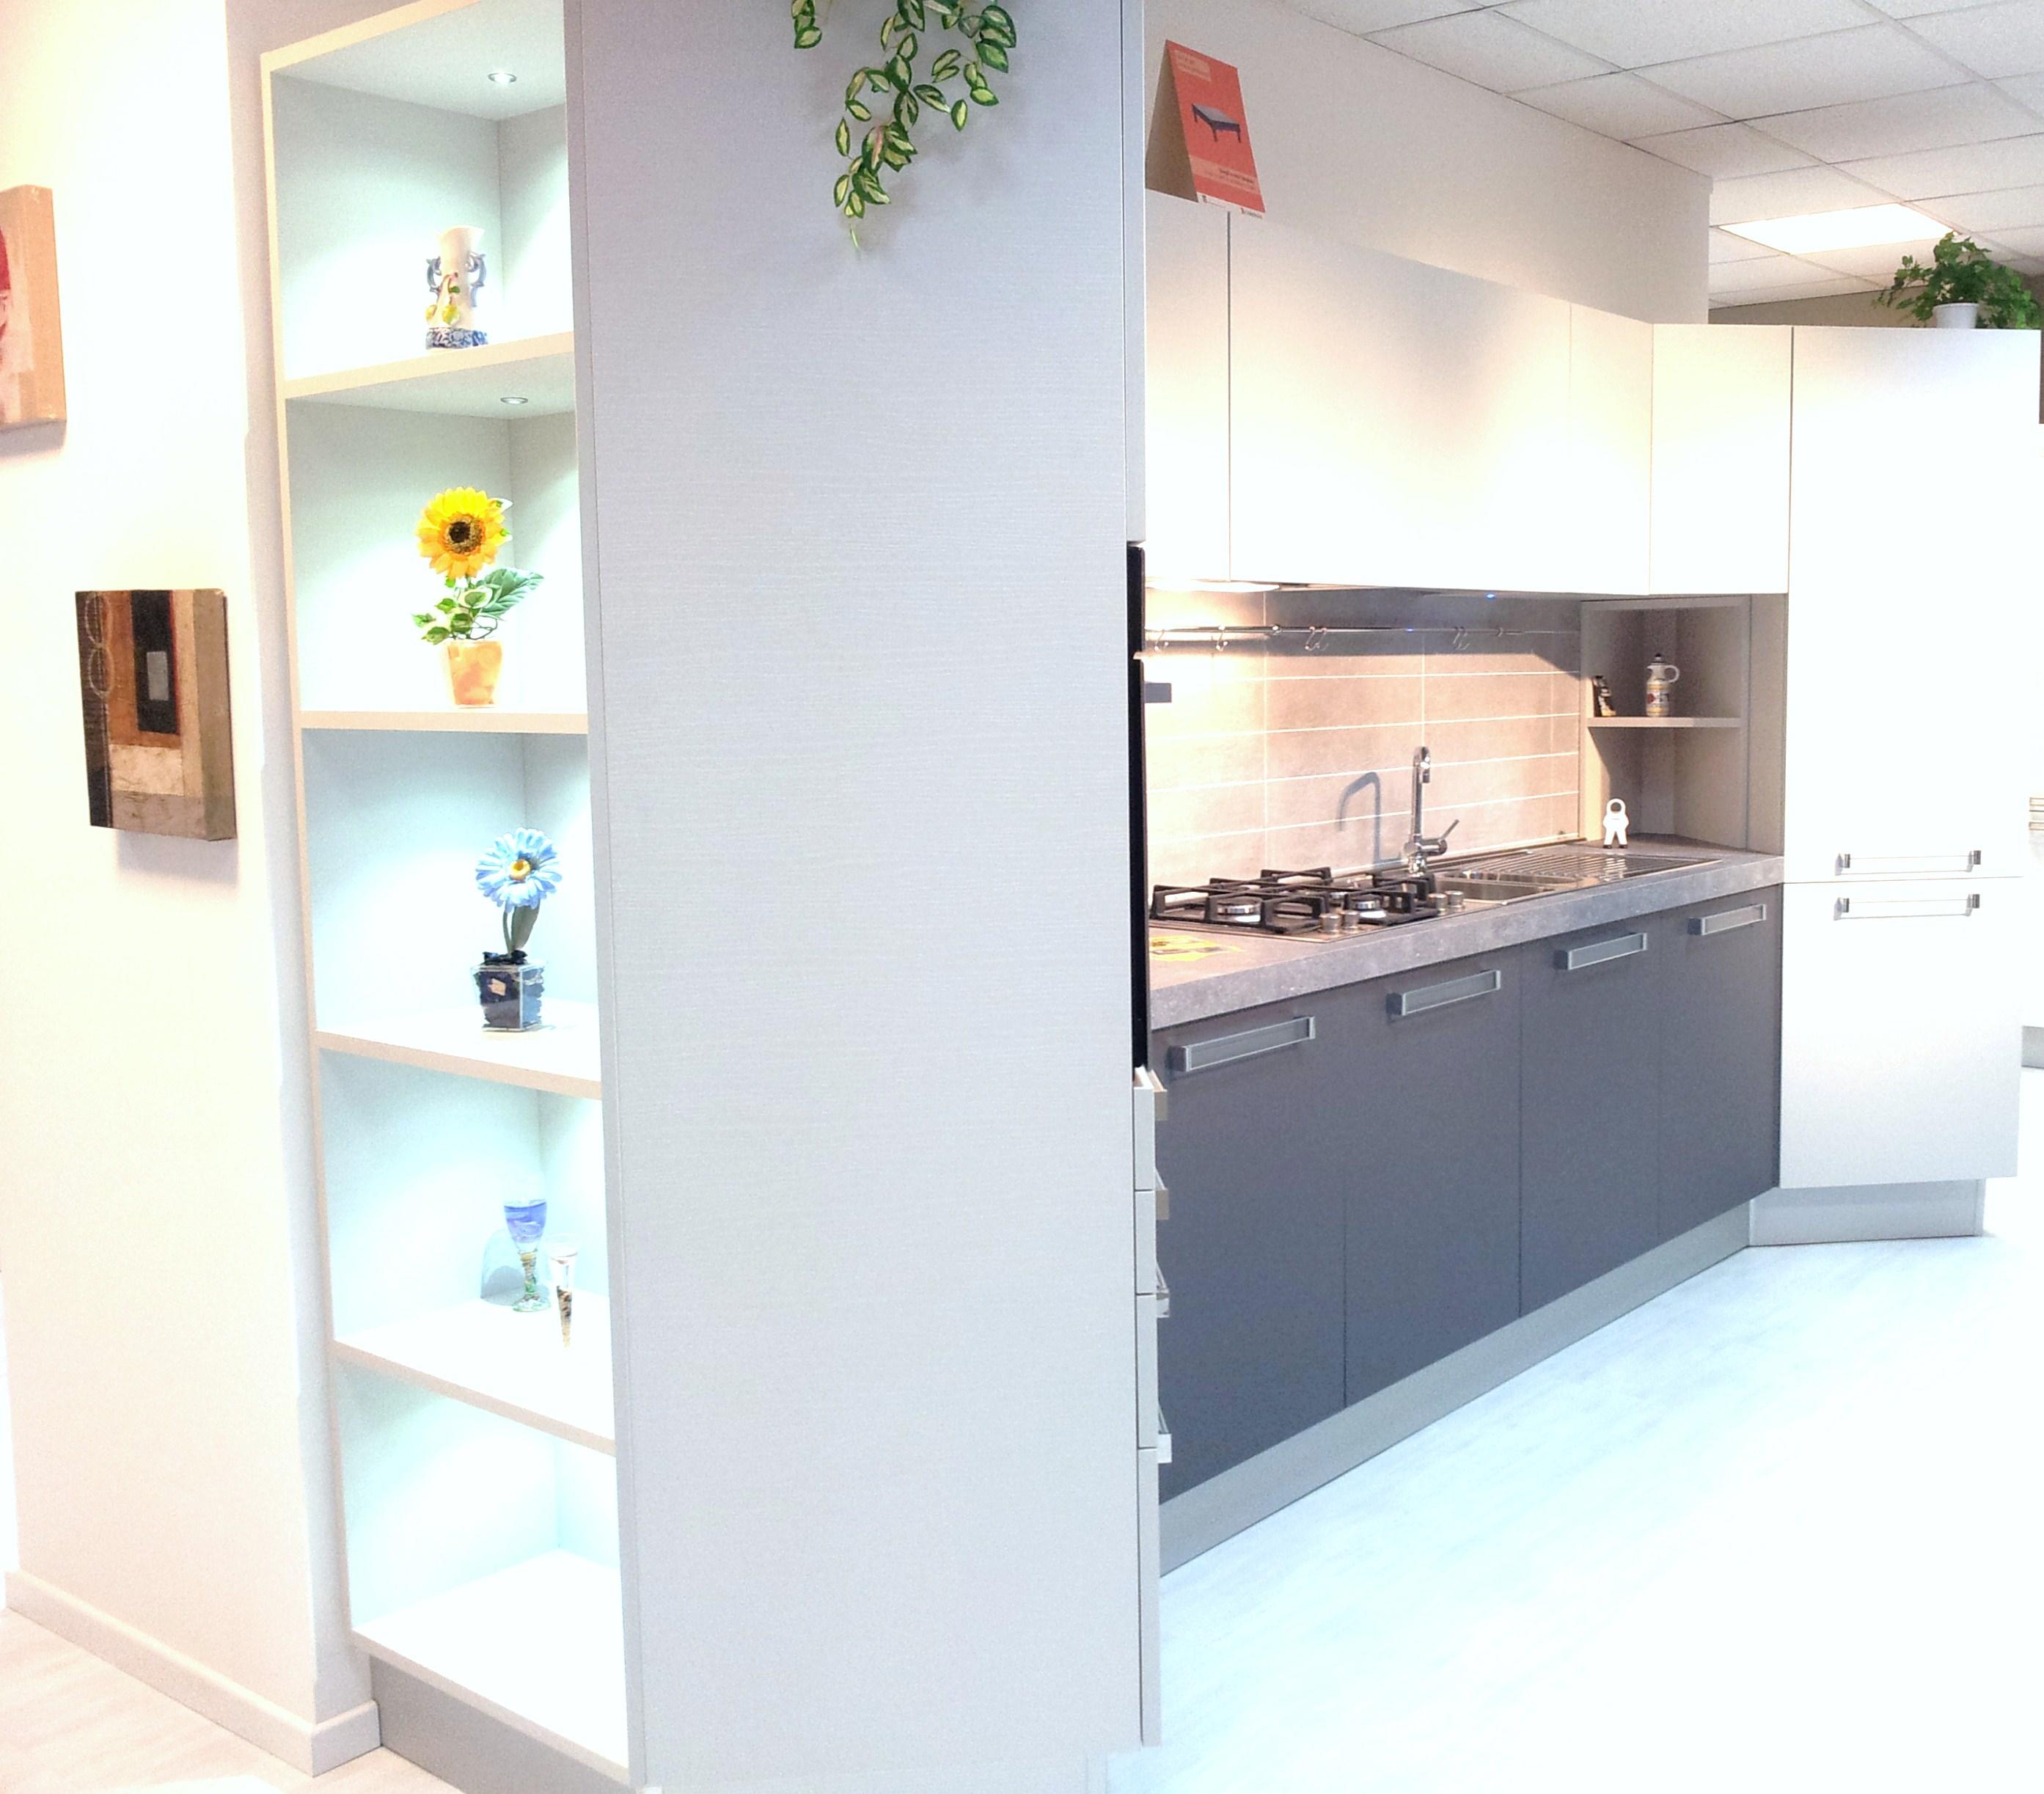 Cucina record cucine people scontato del 69 cucine a for Cucina moderna 3 60